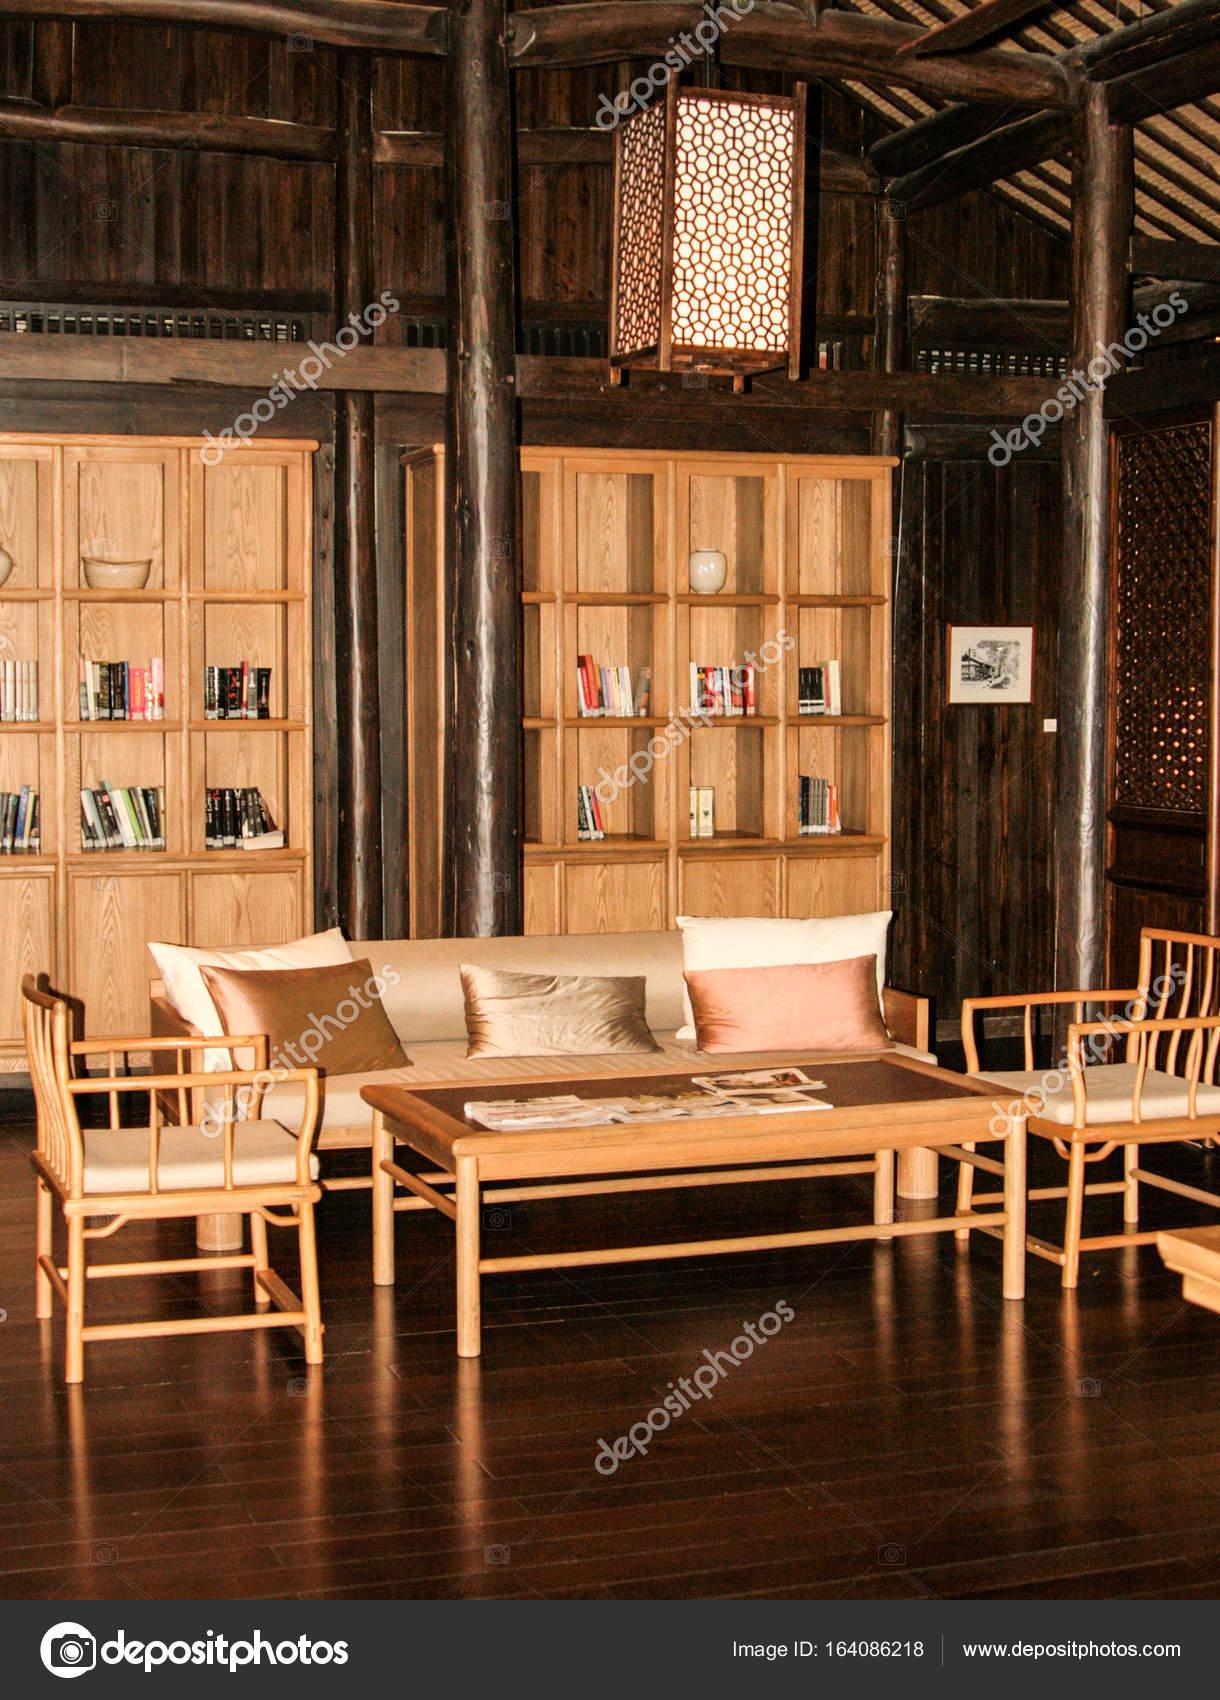 Chinesische traditionelle Interieur — Stockfoto © Linusek #164086218